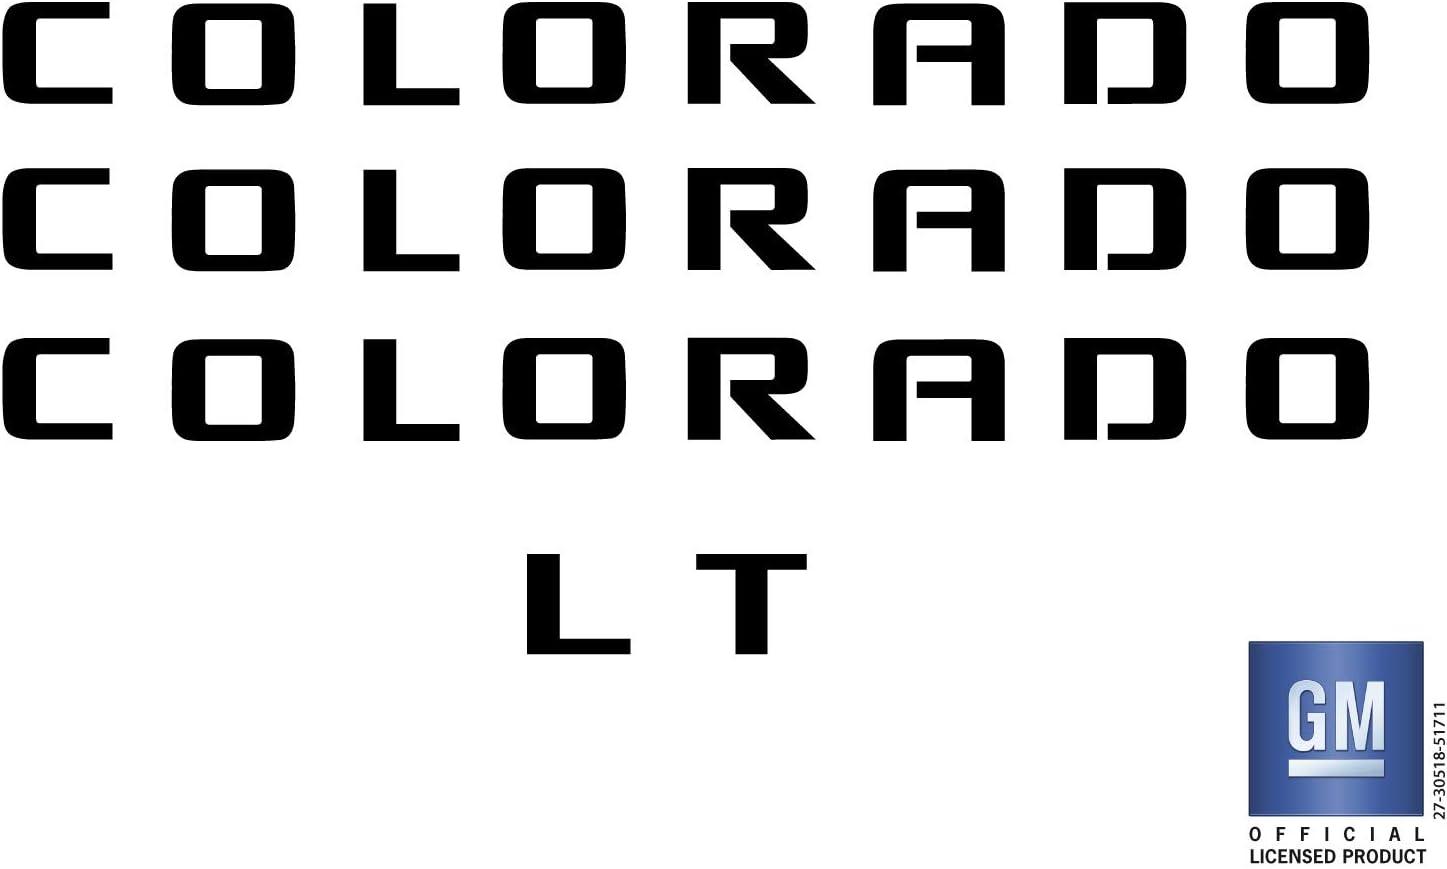 EmblemsPlus Chevy Colorado LT Truck Emblem Overlay Decal Letters (Black) Set of 4 Fit 2015 Thru 2018. GM Official Licensed Product.